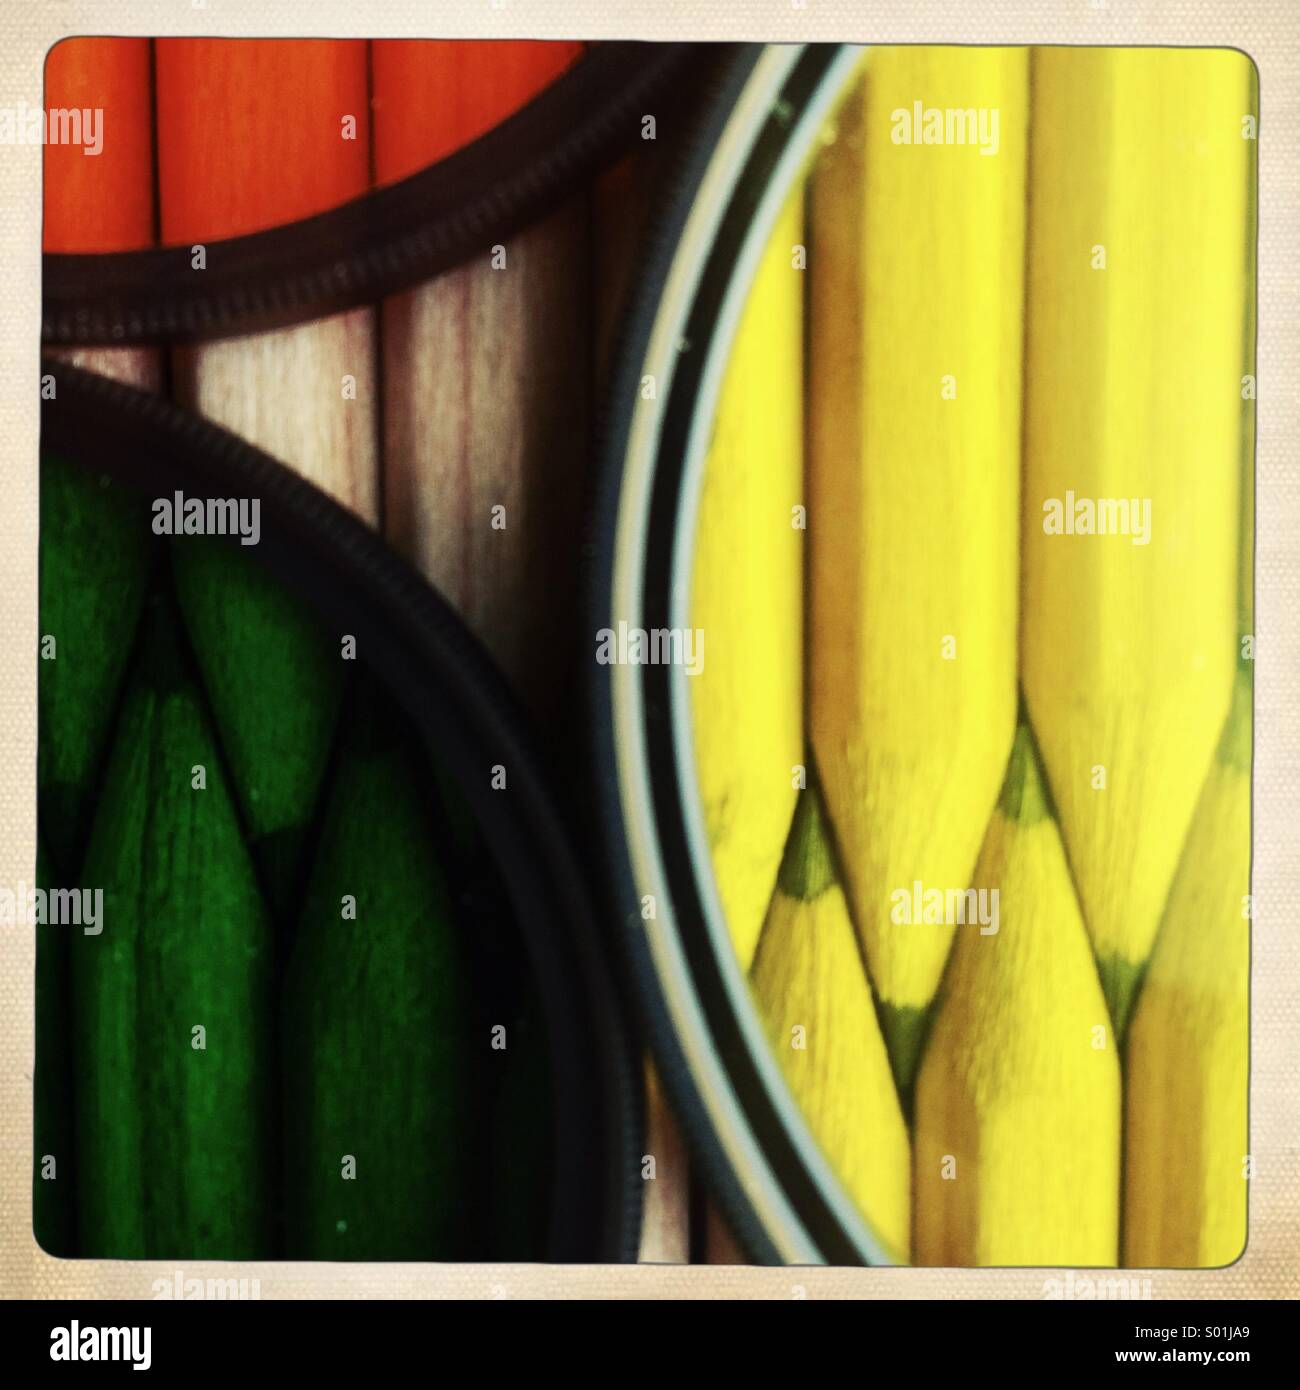 Bleistifte hinter fotografische Farbfilter Stockbild